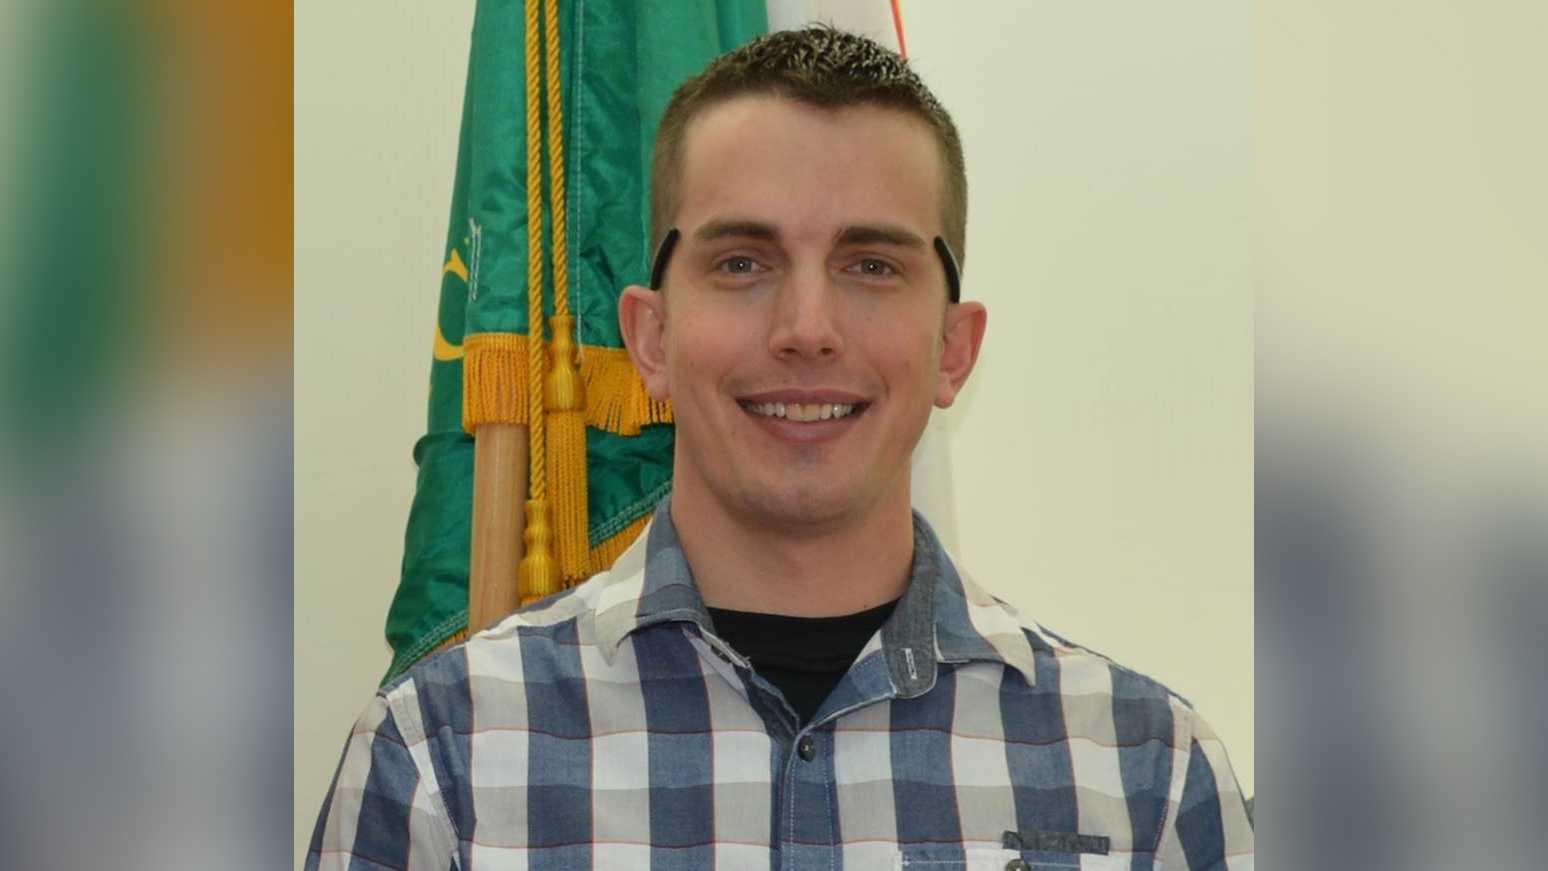 Placer County Sheriff's Deputy Austin Harper